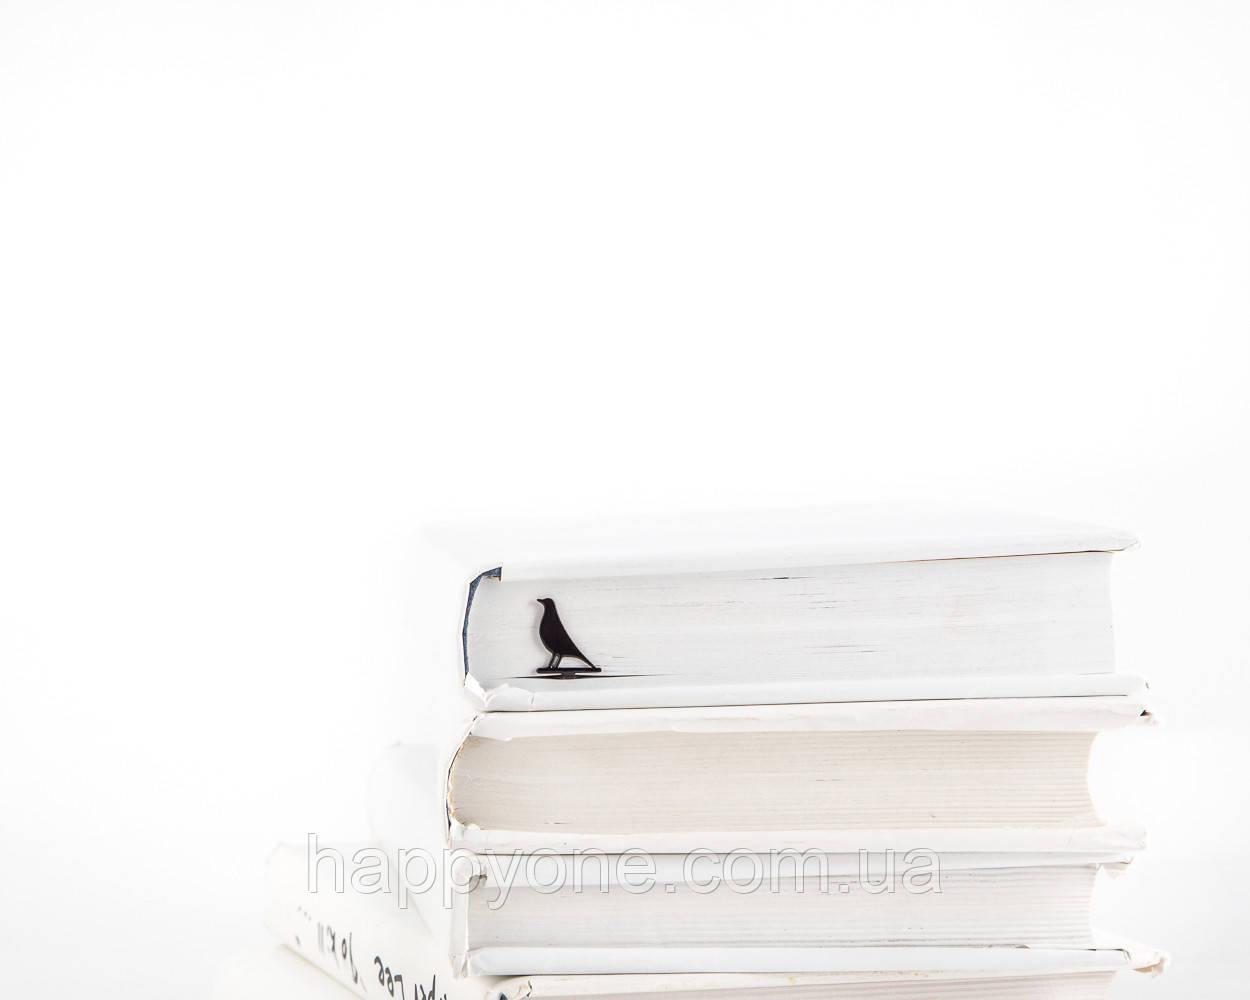 Закладка для книг Птица Имса